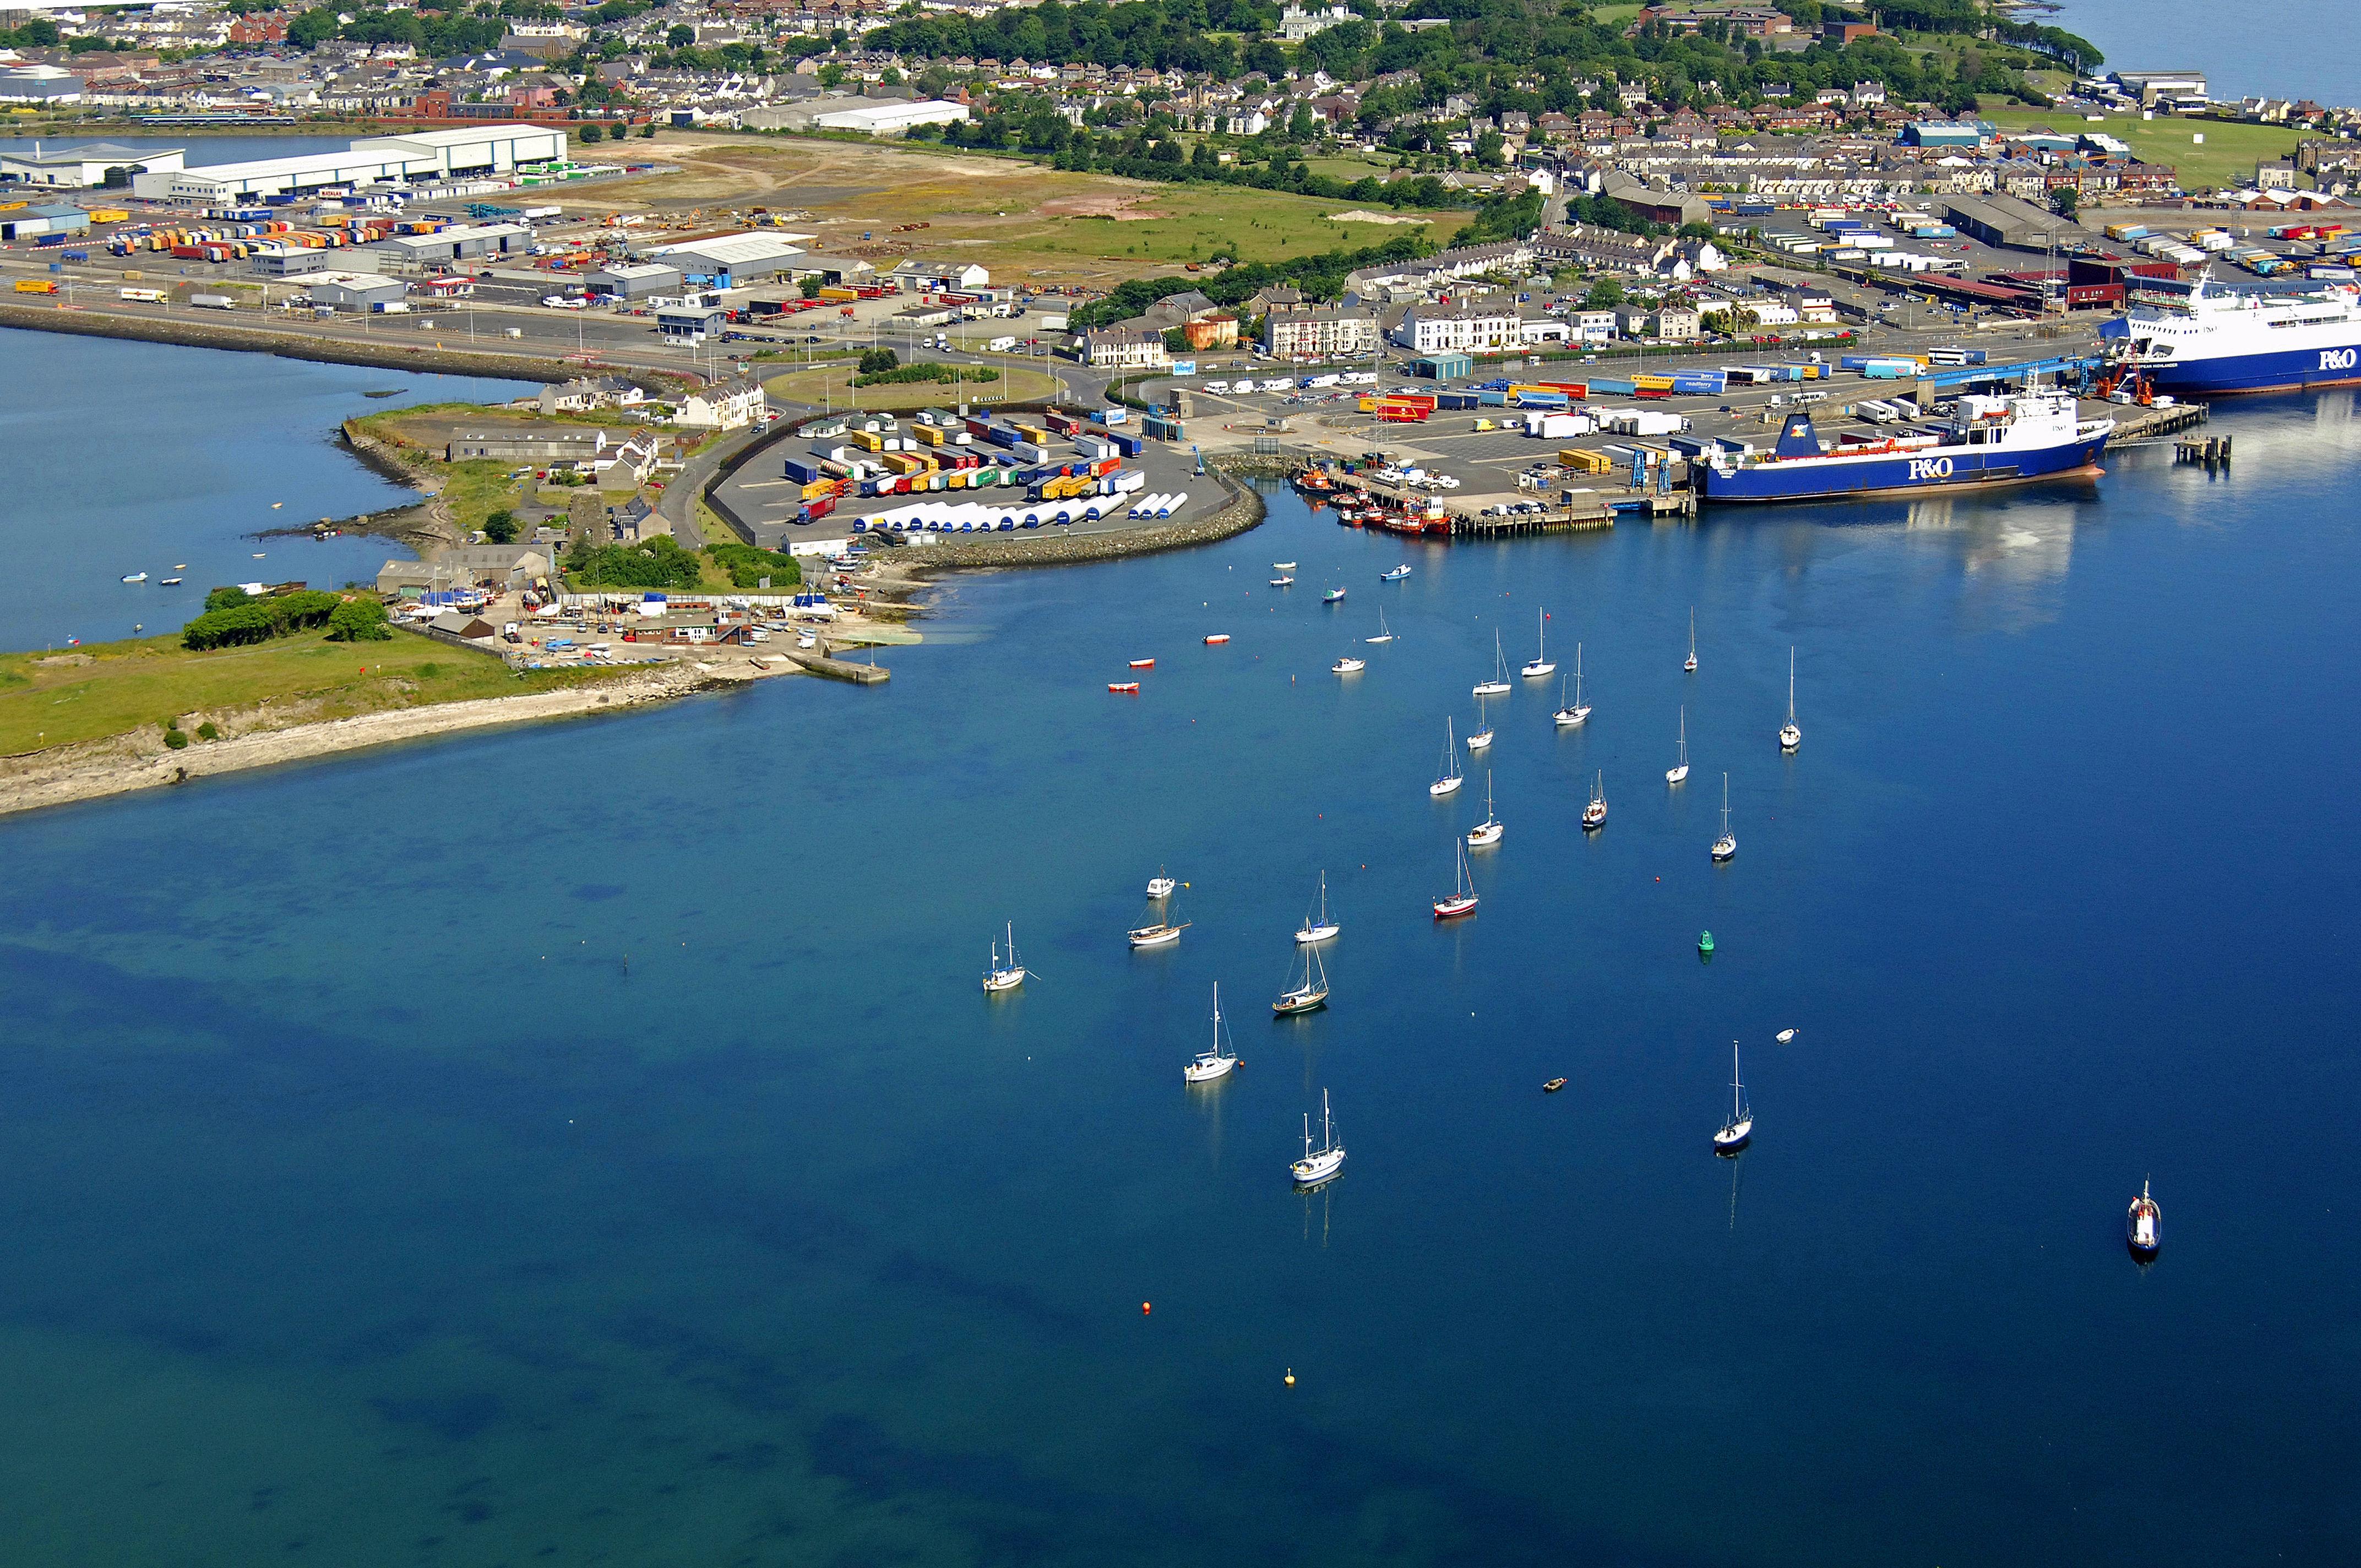 East Antrim Boat Club in Larne, NI, United Kingdom - Marina